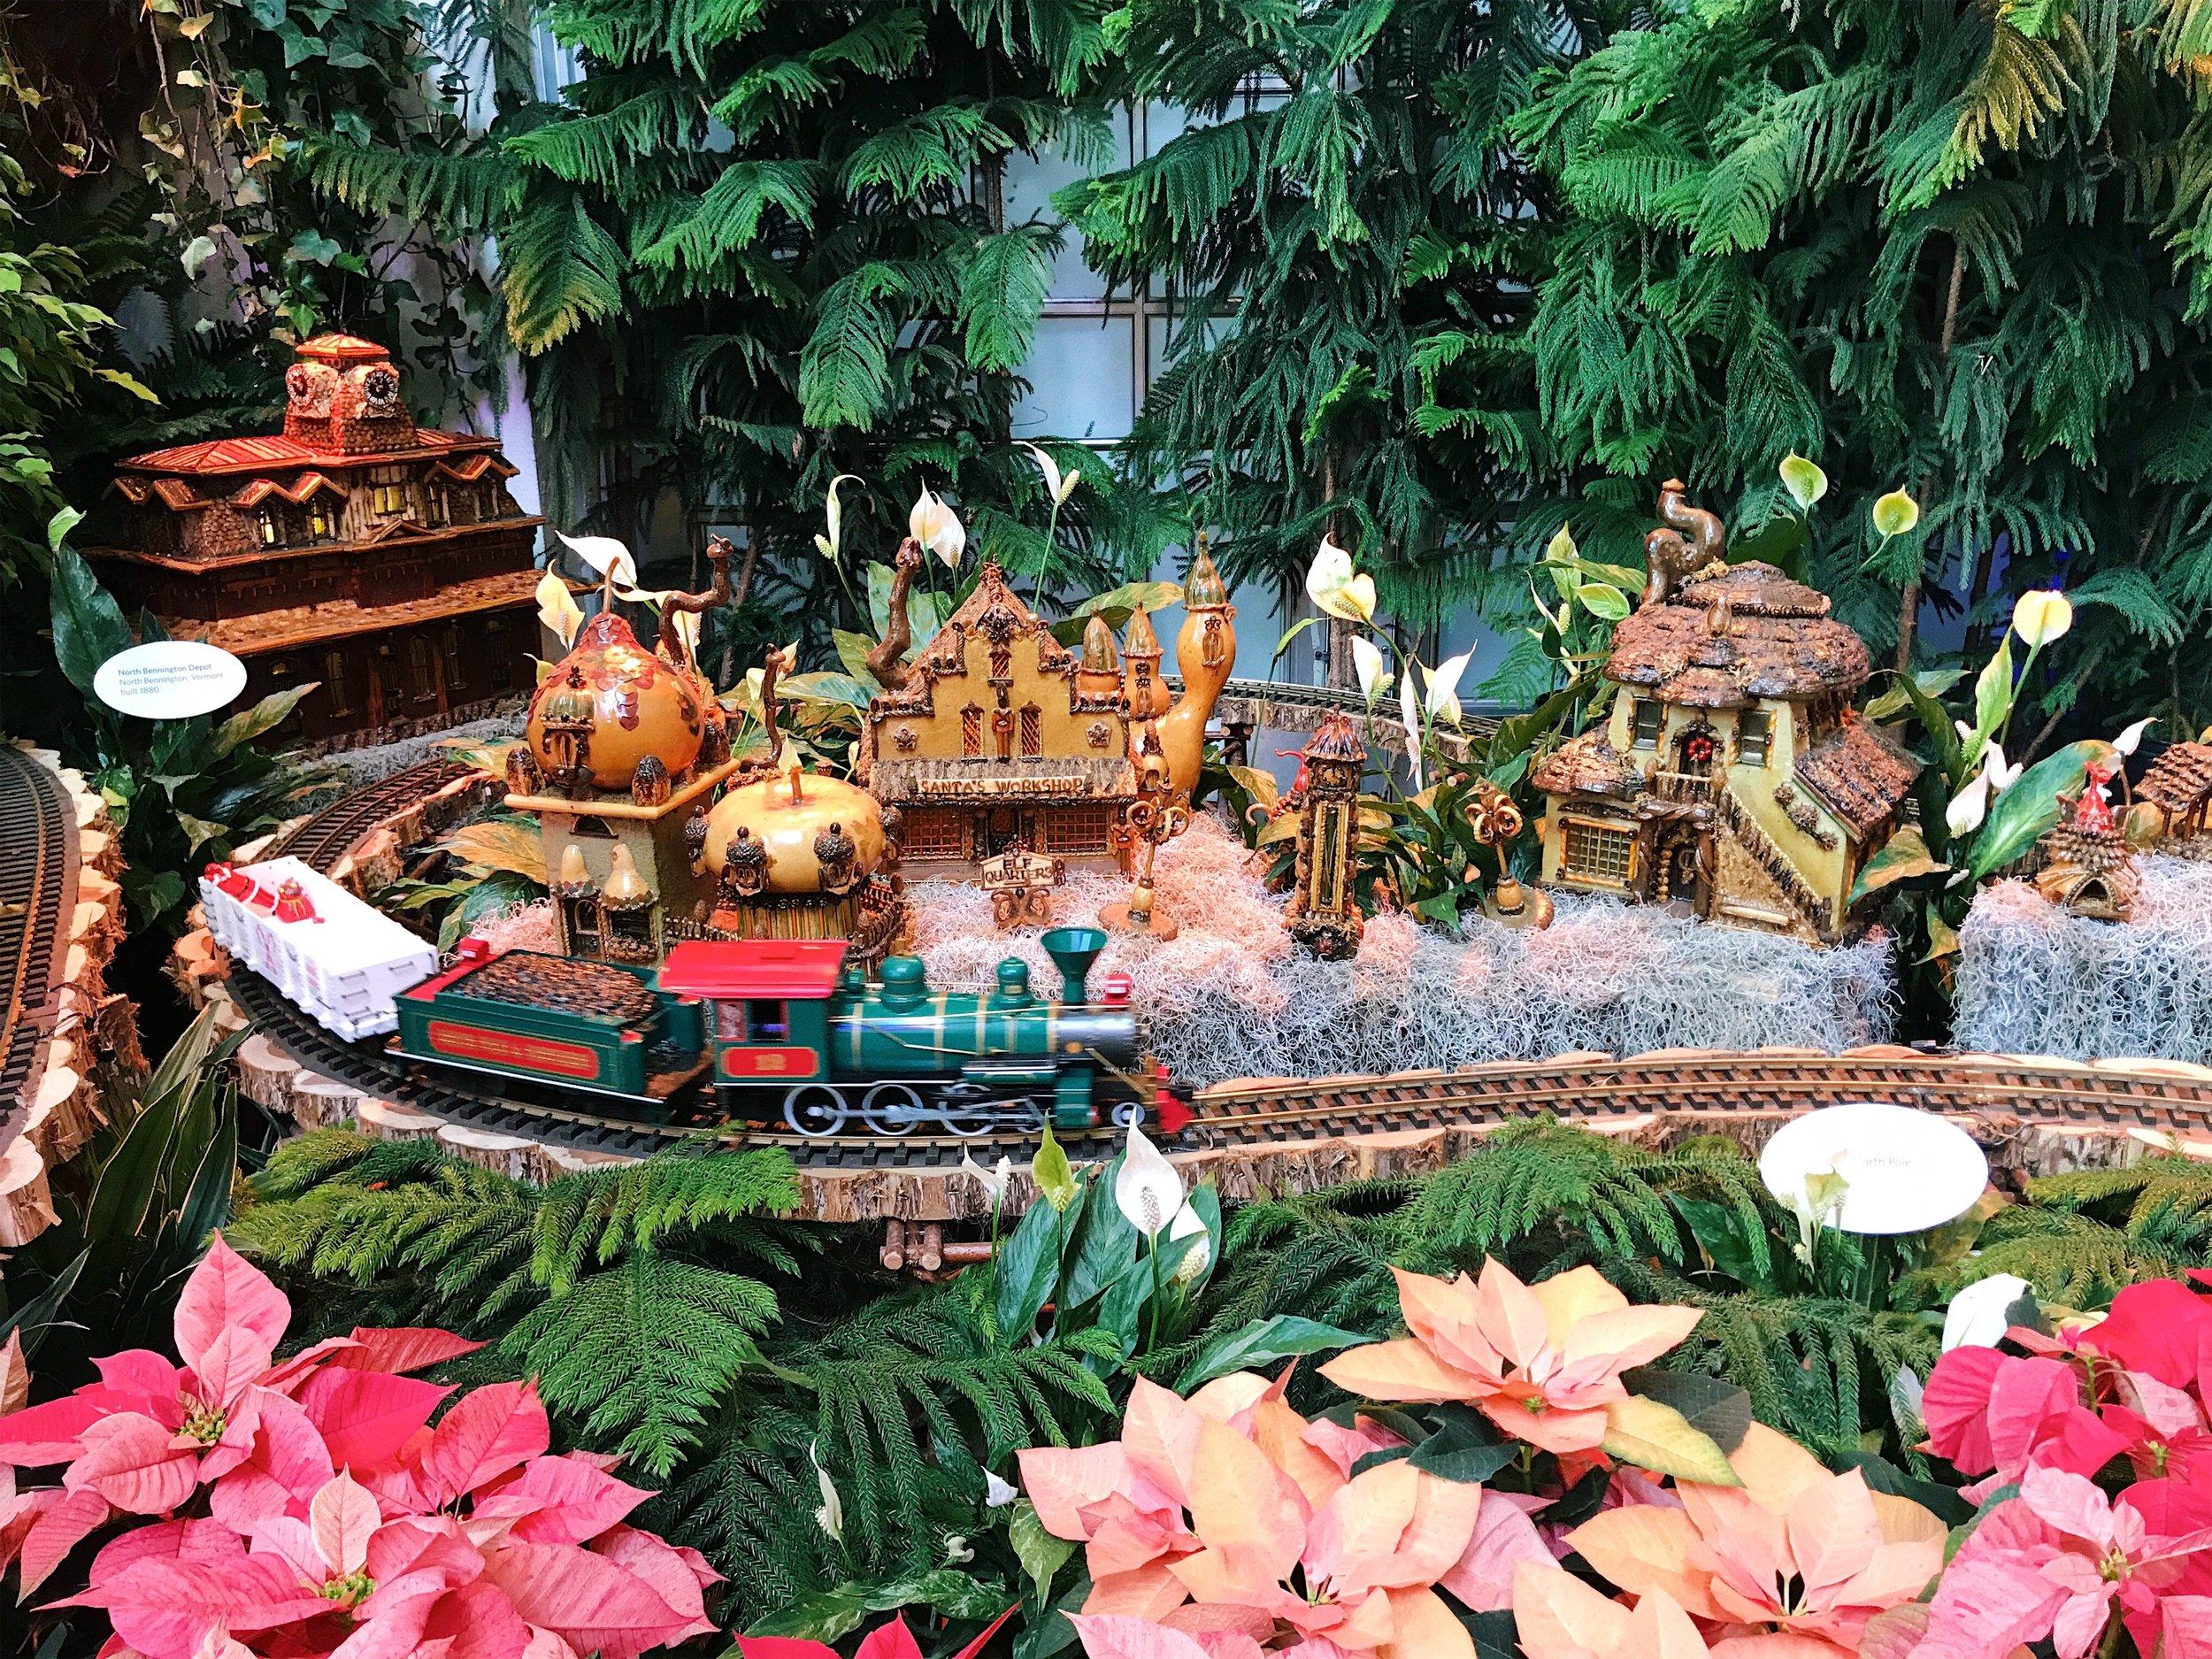 Christmas decorations in Washington D.C.